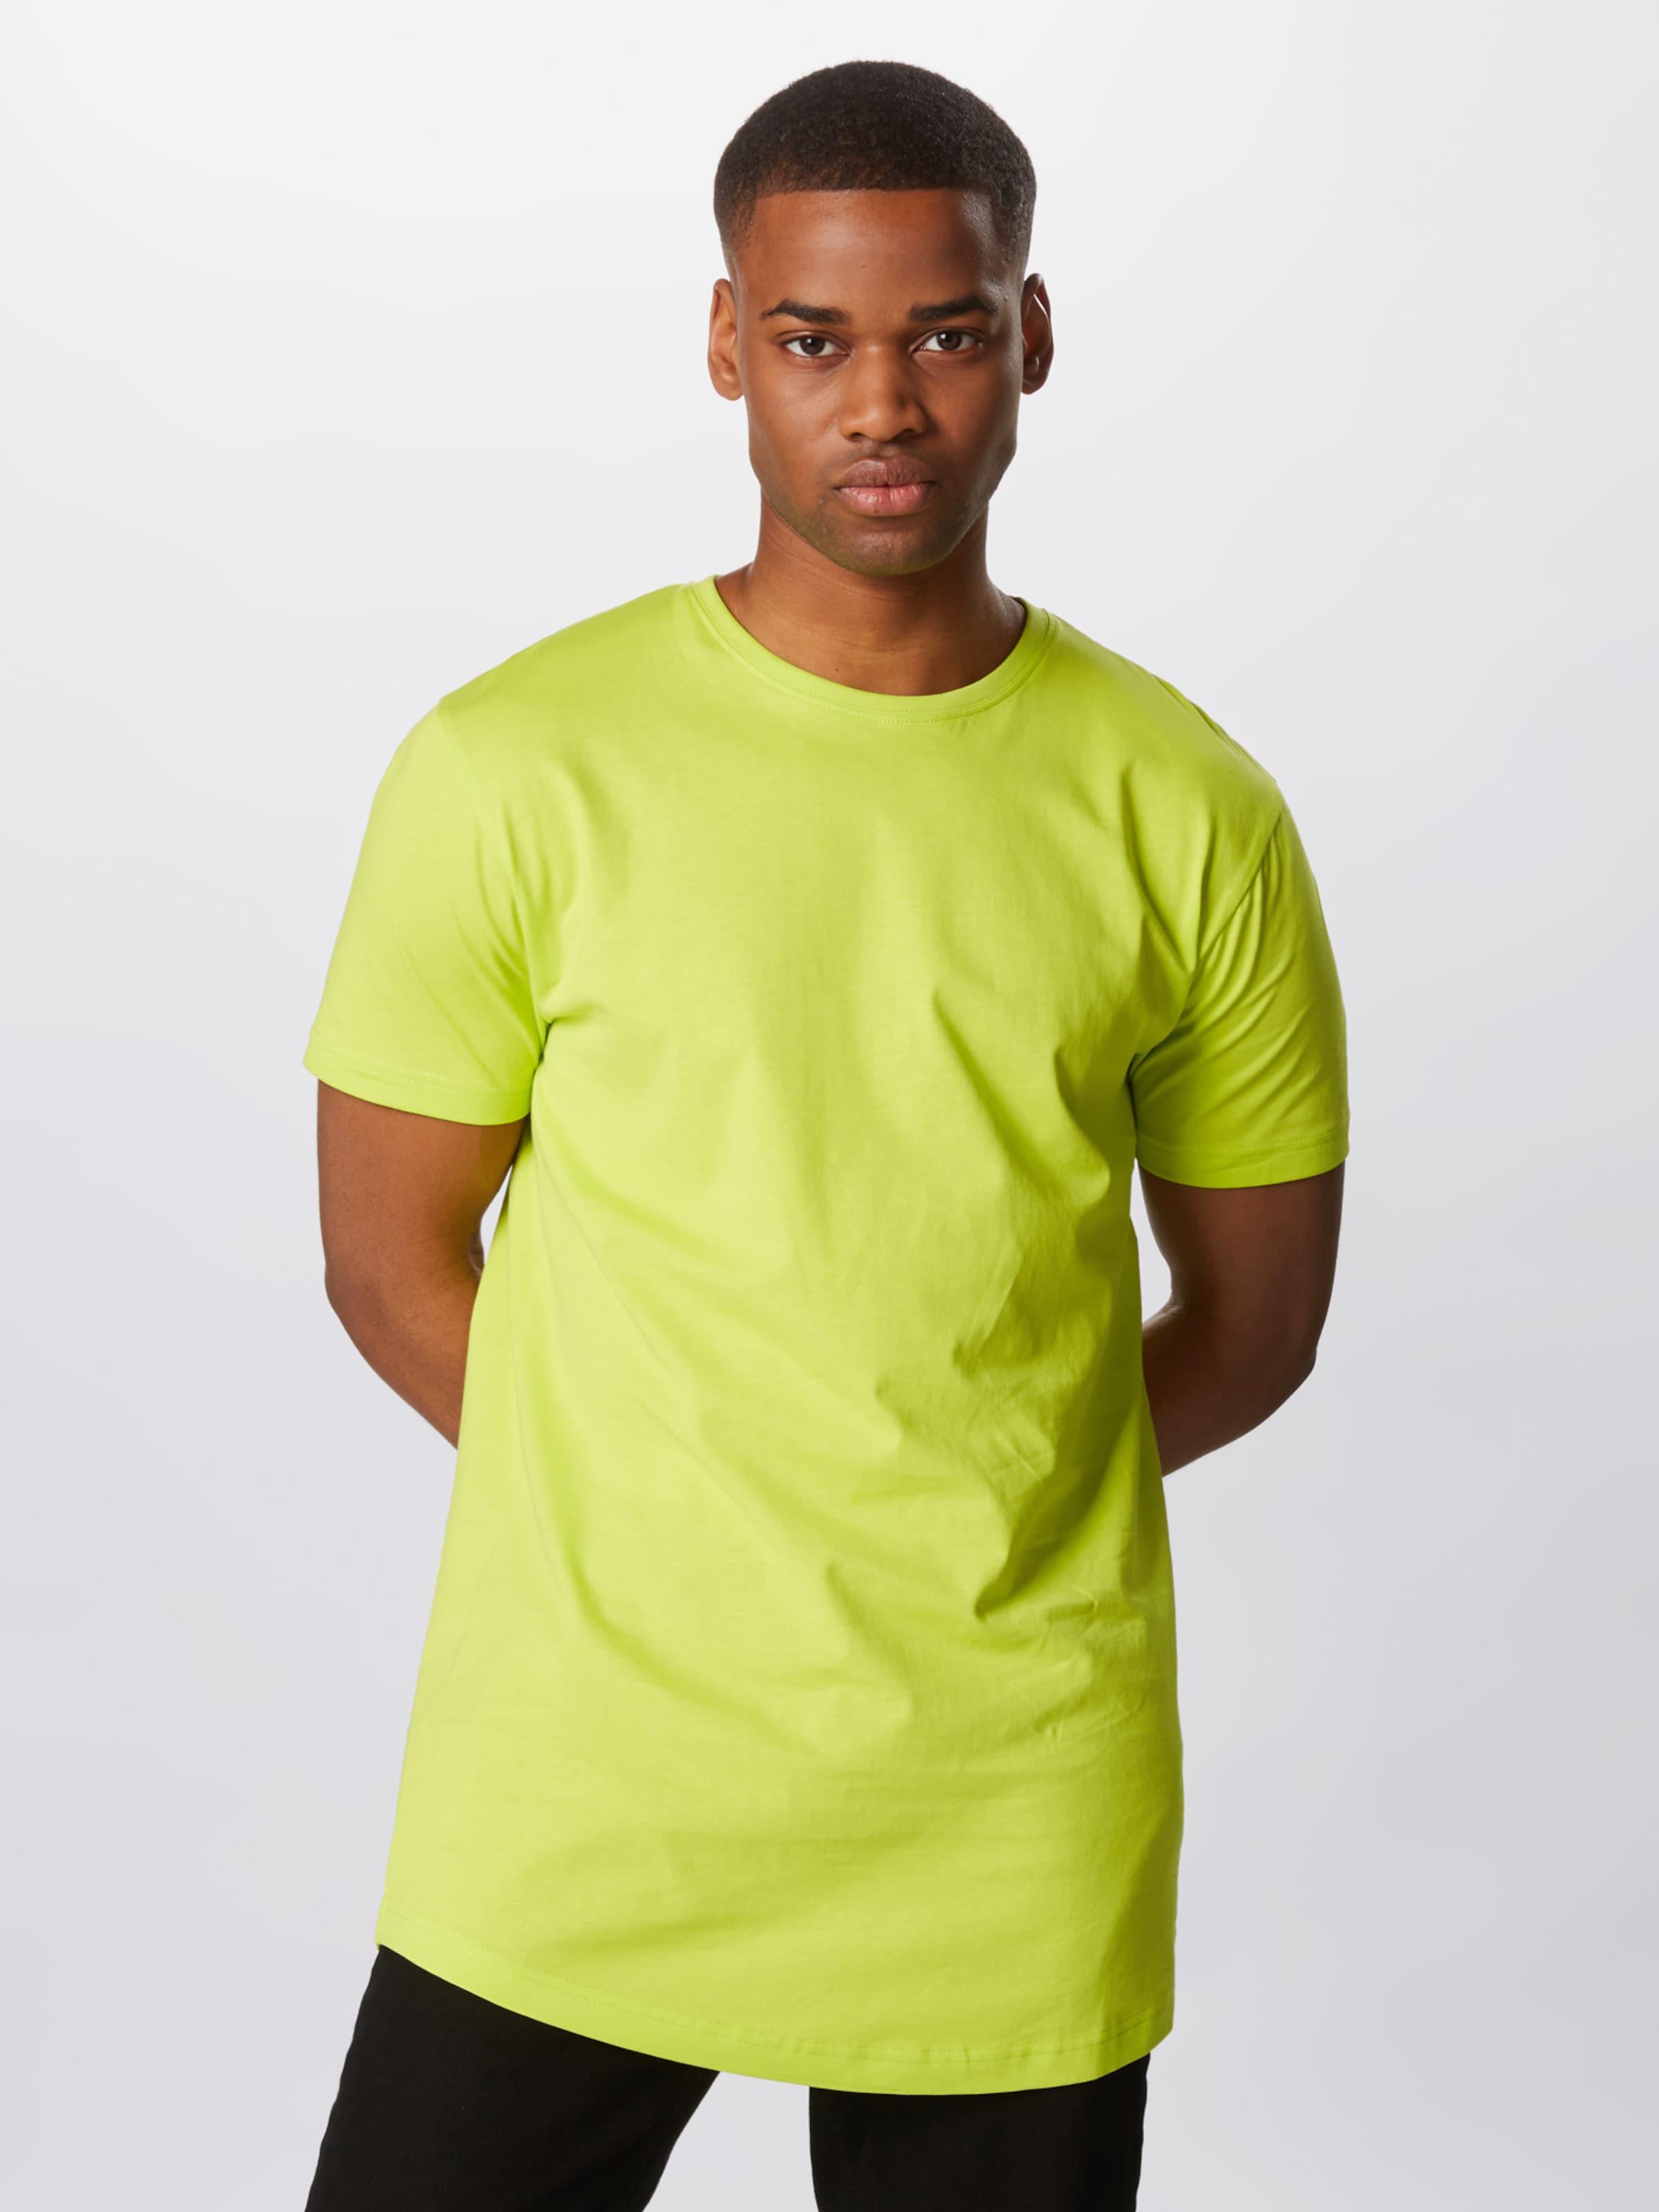 Urban Classics T-Shirt in zitronengelb Abgesteppter Saum/Kante TB638-01494-0058